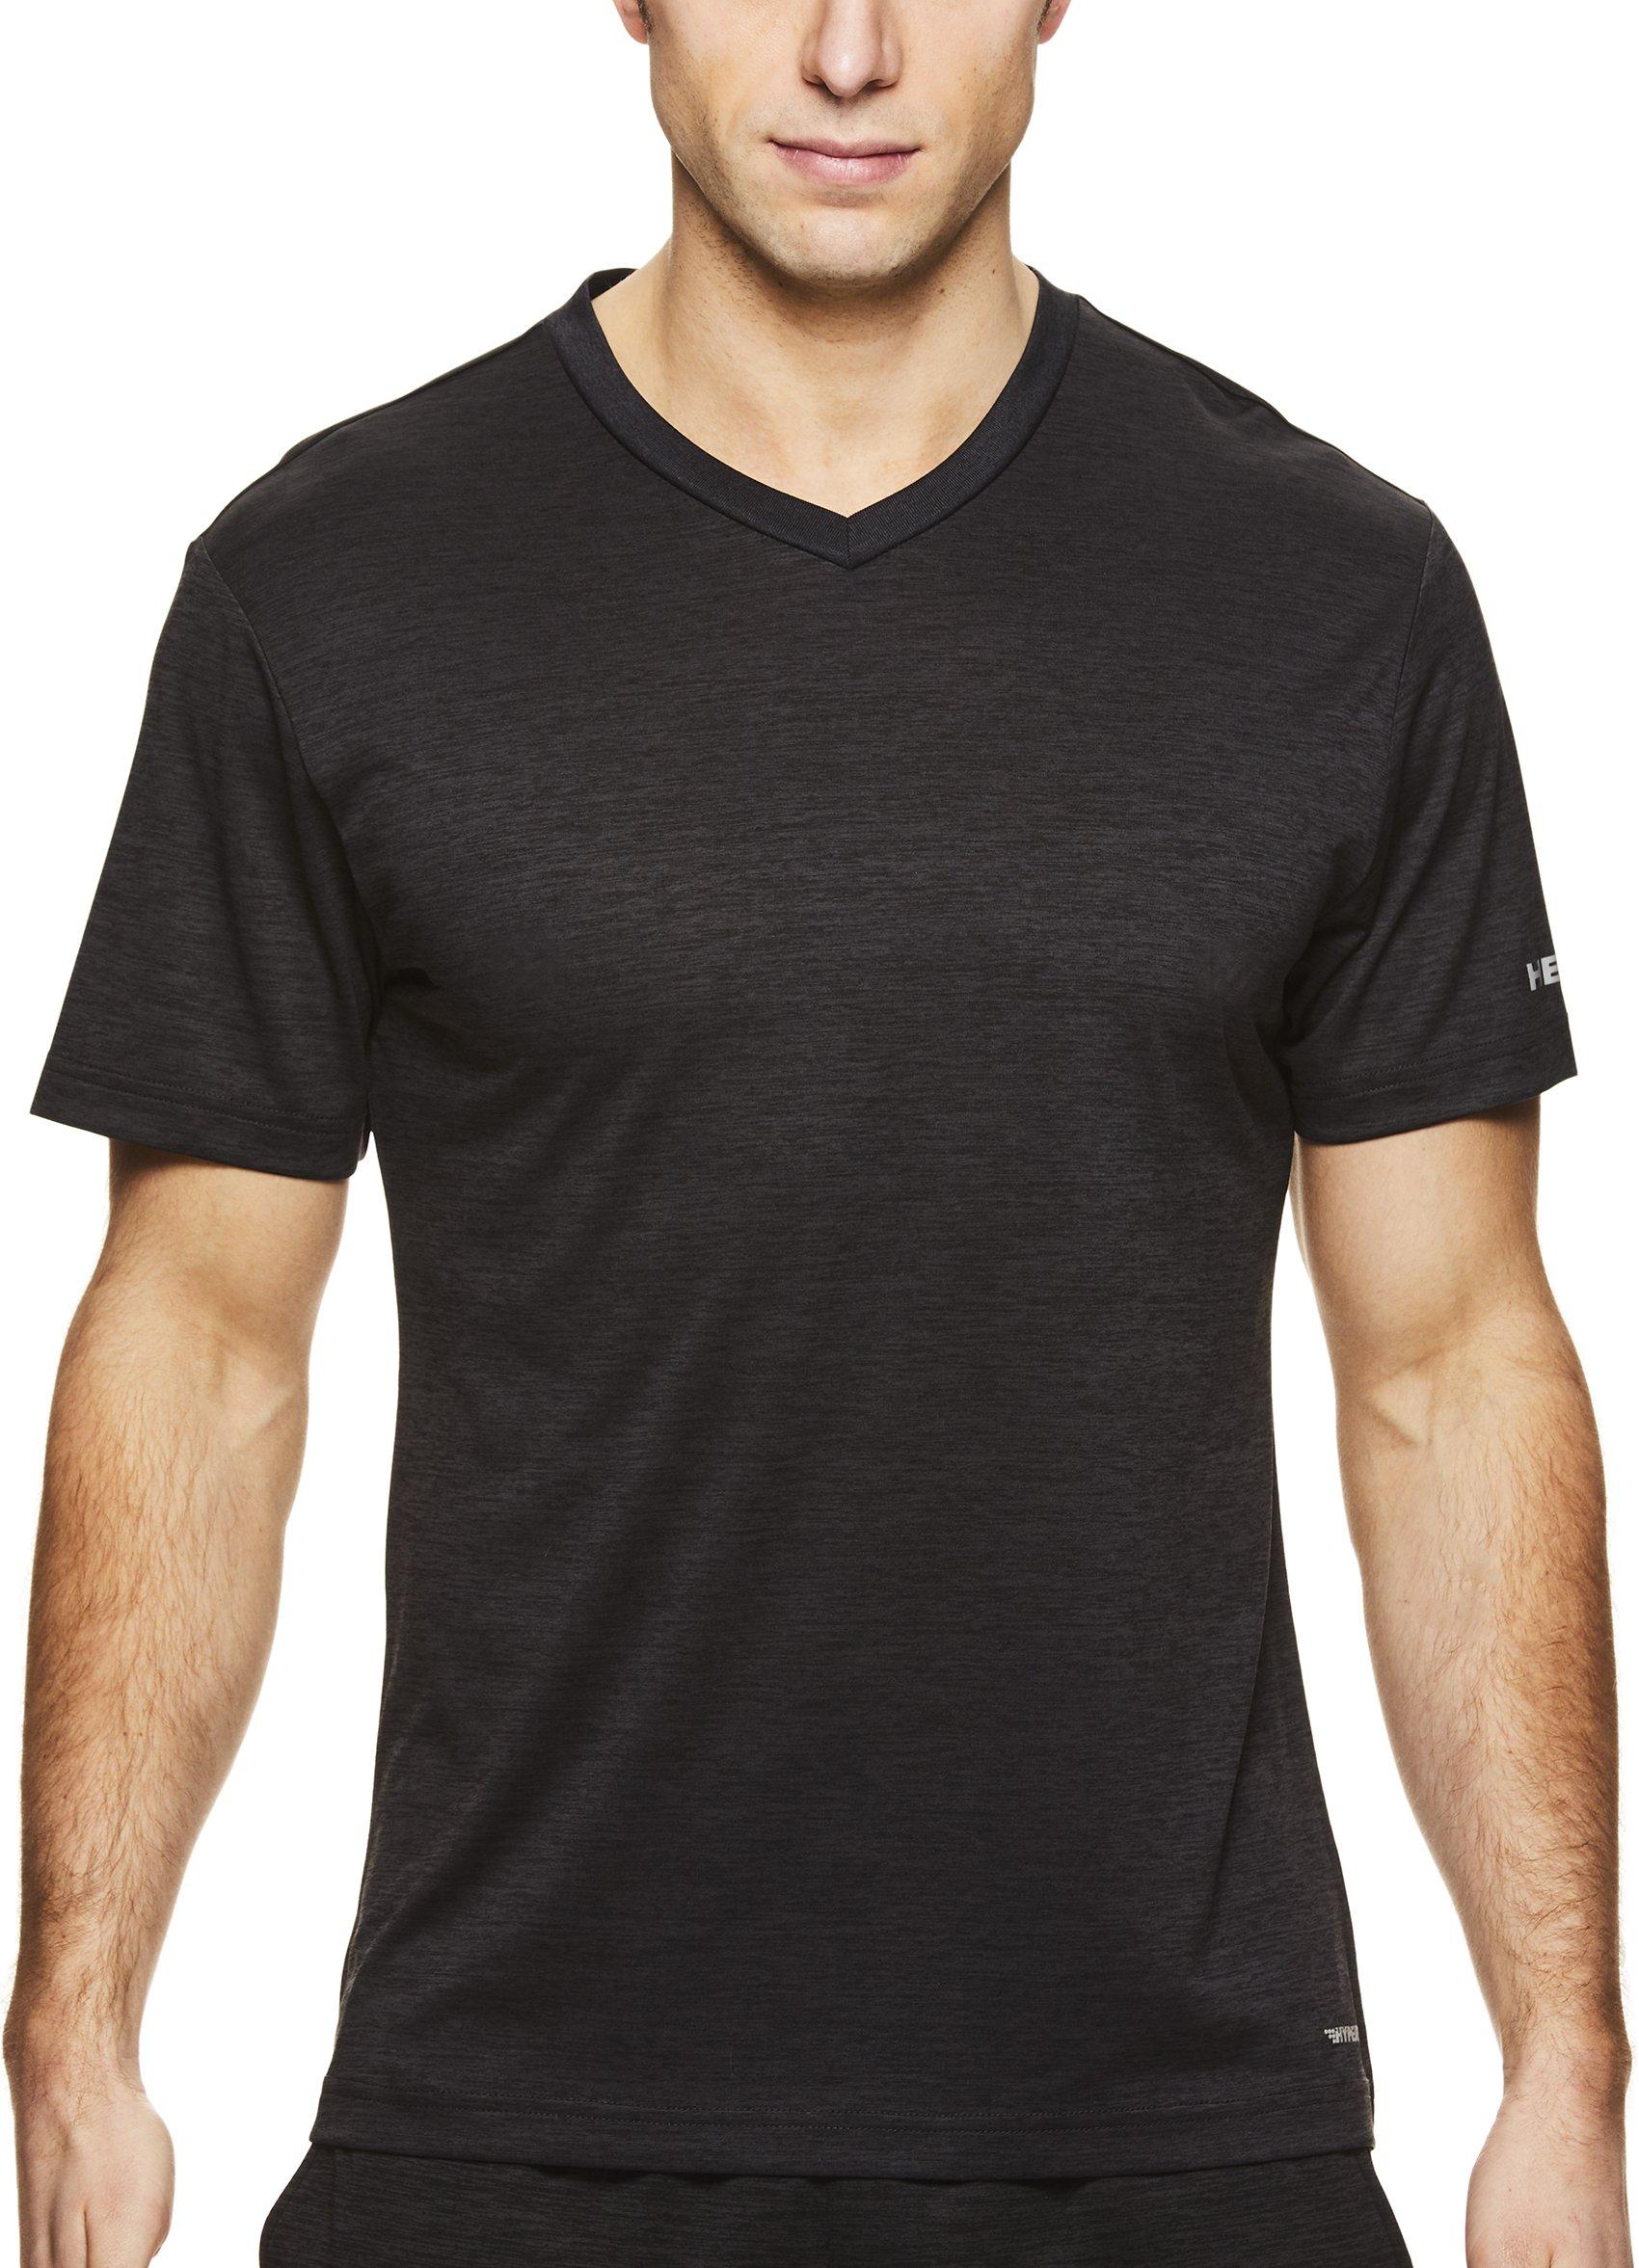 HEAD Men's V Neck Gym Training & Workout T-Shirt - Short Sleeve Activewear Top - Distance Black Heather, Medium